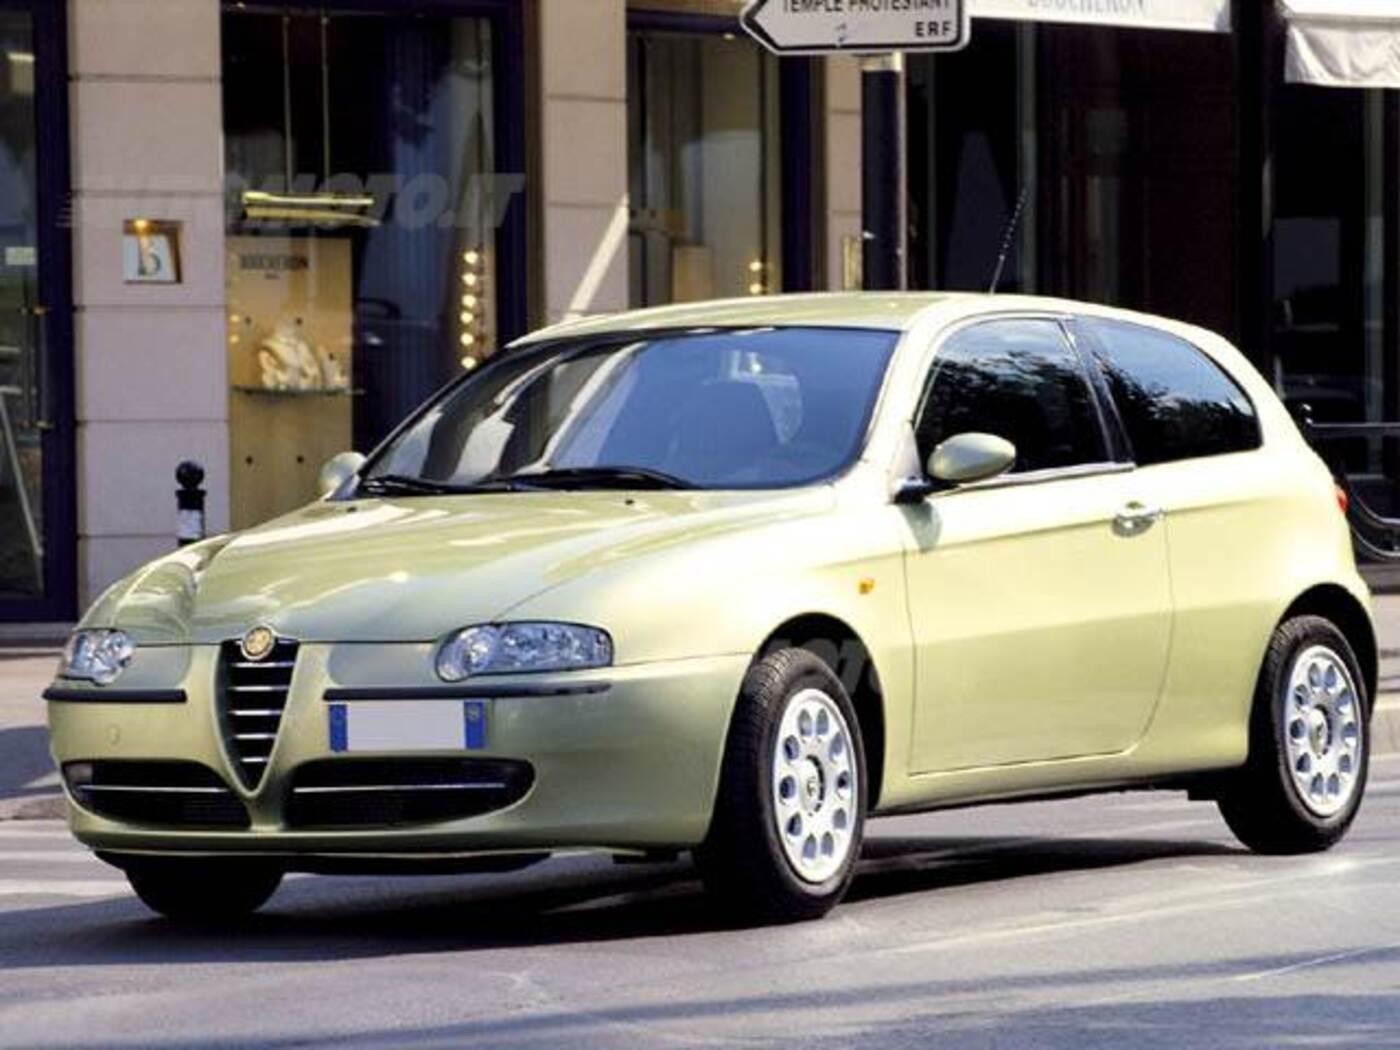 4 CANDELE NGK ALFA ROMEO 147 1.6 16V TWIN SPARK ECO 1600 BENZINA 105 CAVALLI 4